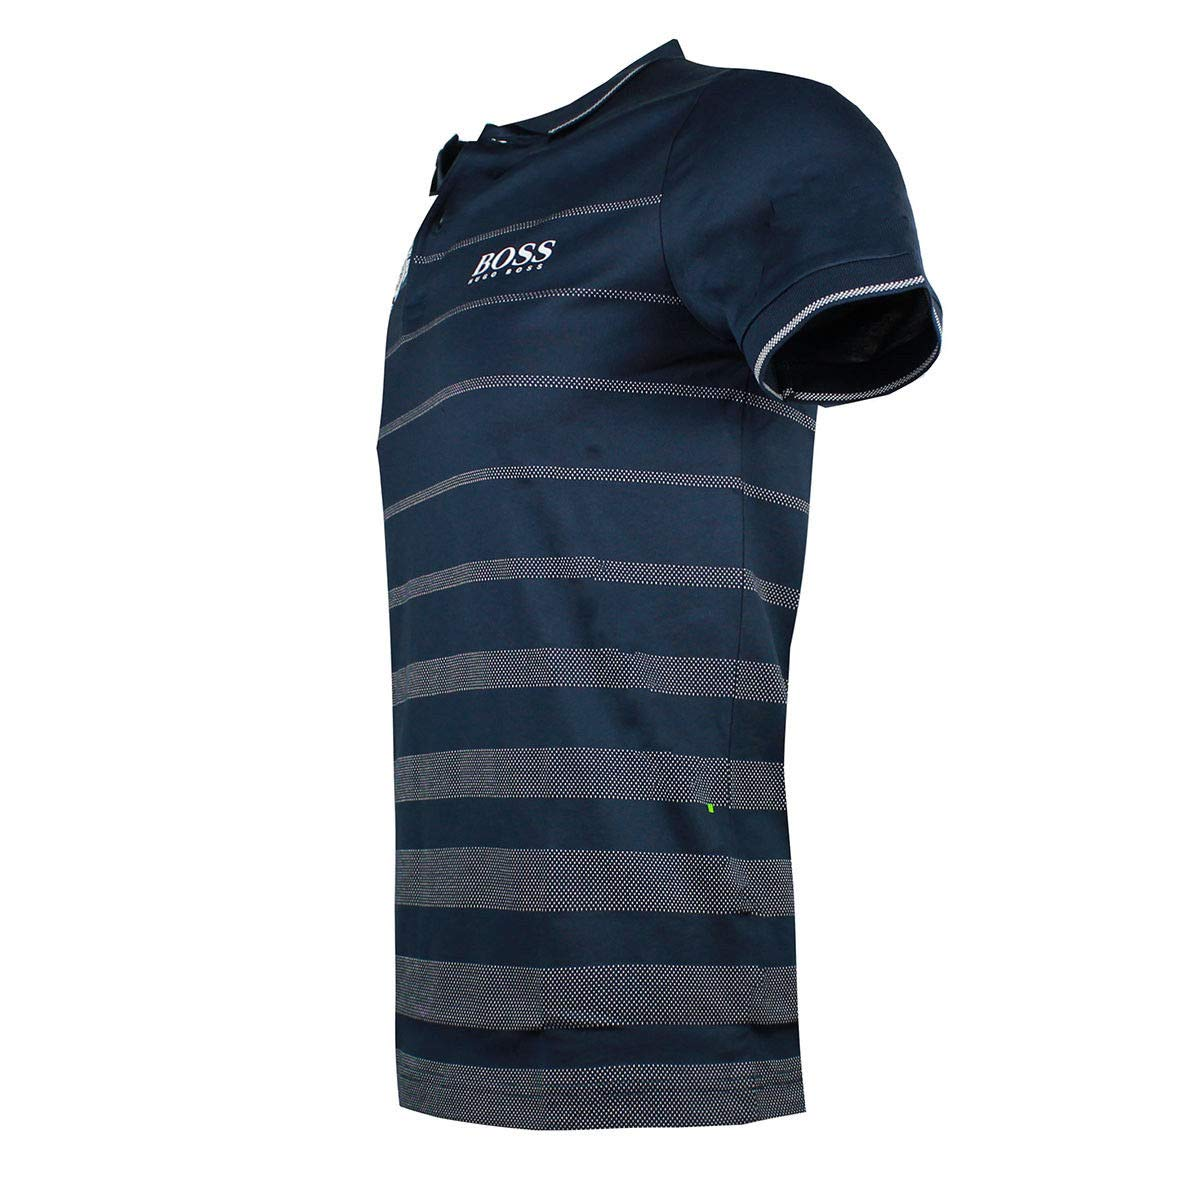 d8be6c638796 Hugo Boss T Shirts Online India - DREAMWORKS